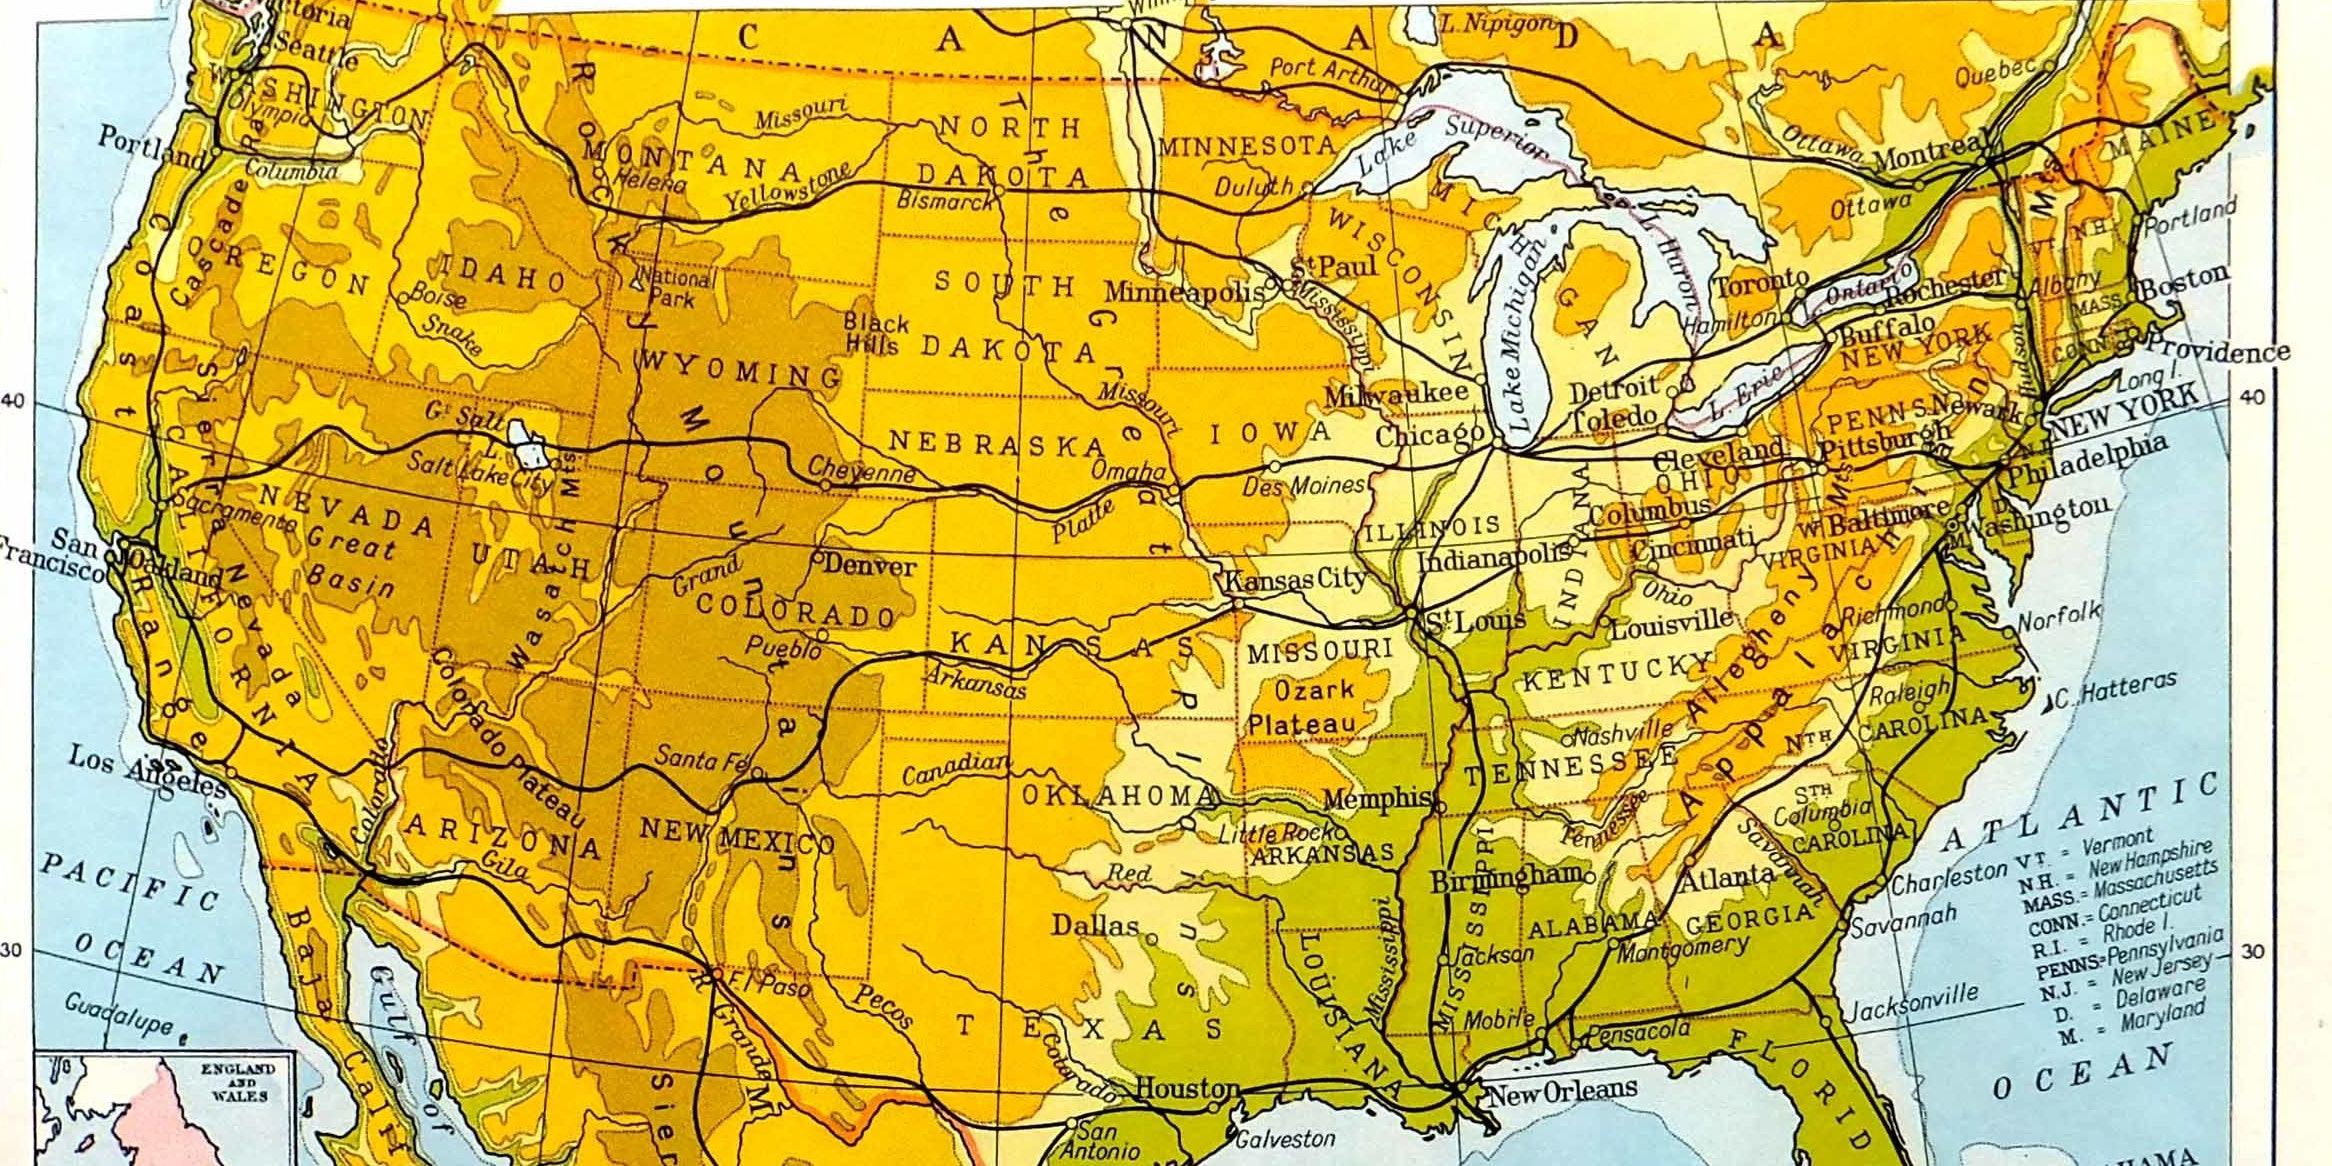 Vintage US map